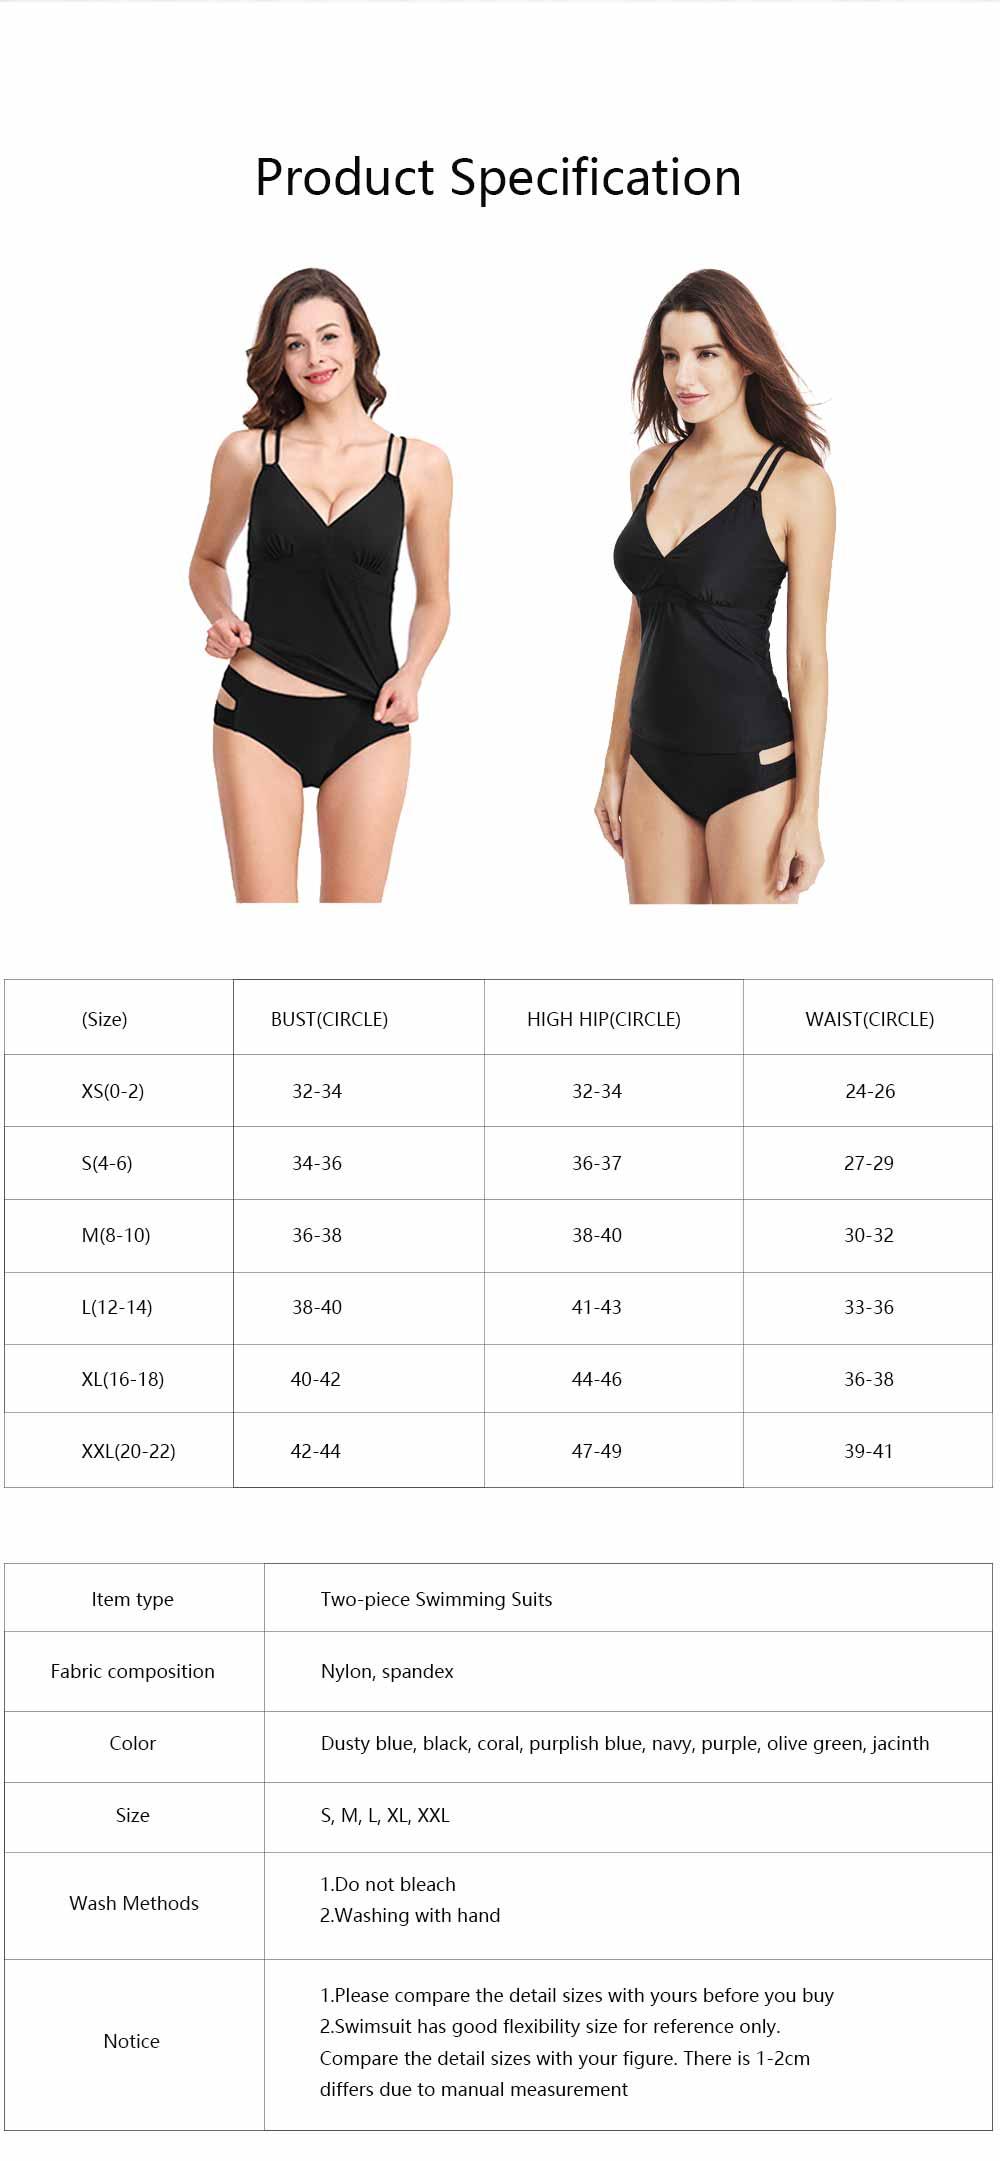 Women Cross Straps Bikini, Removeable Soft Cup Bikini, High Elastic Two Piece Swimming Suits for Ladies Girls 6